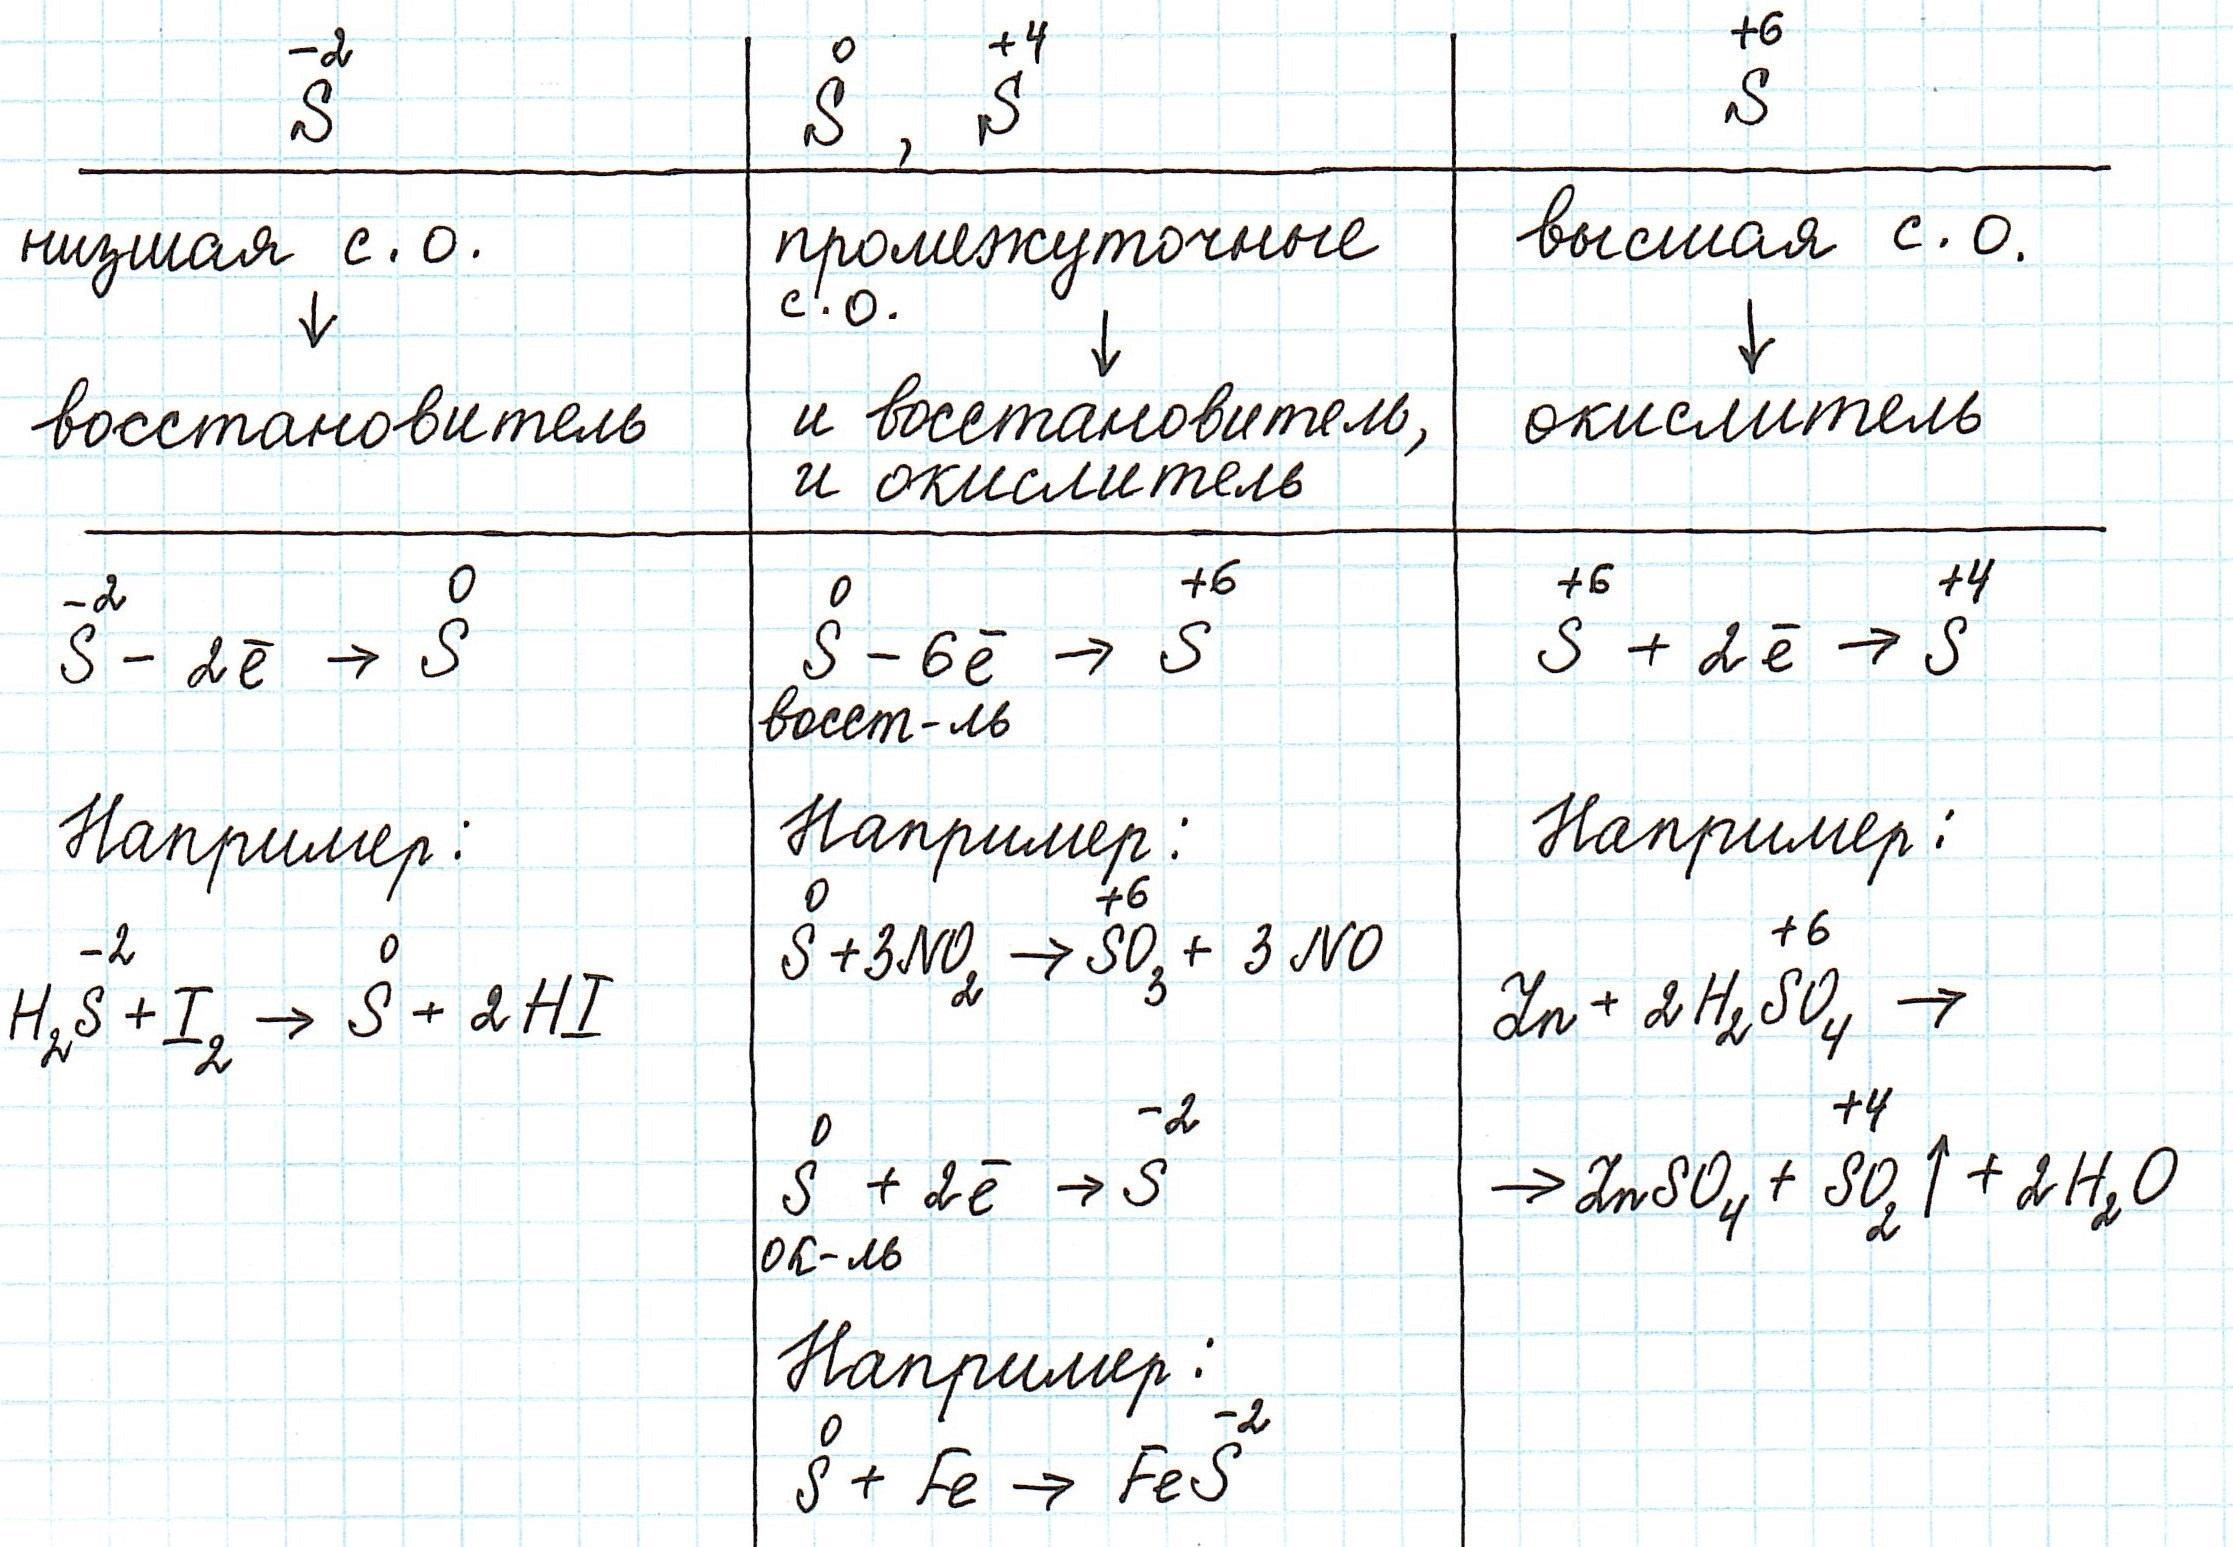 okisliteli-i-vosstanoviteli-v-ximicheskix-reakciyax